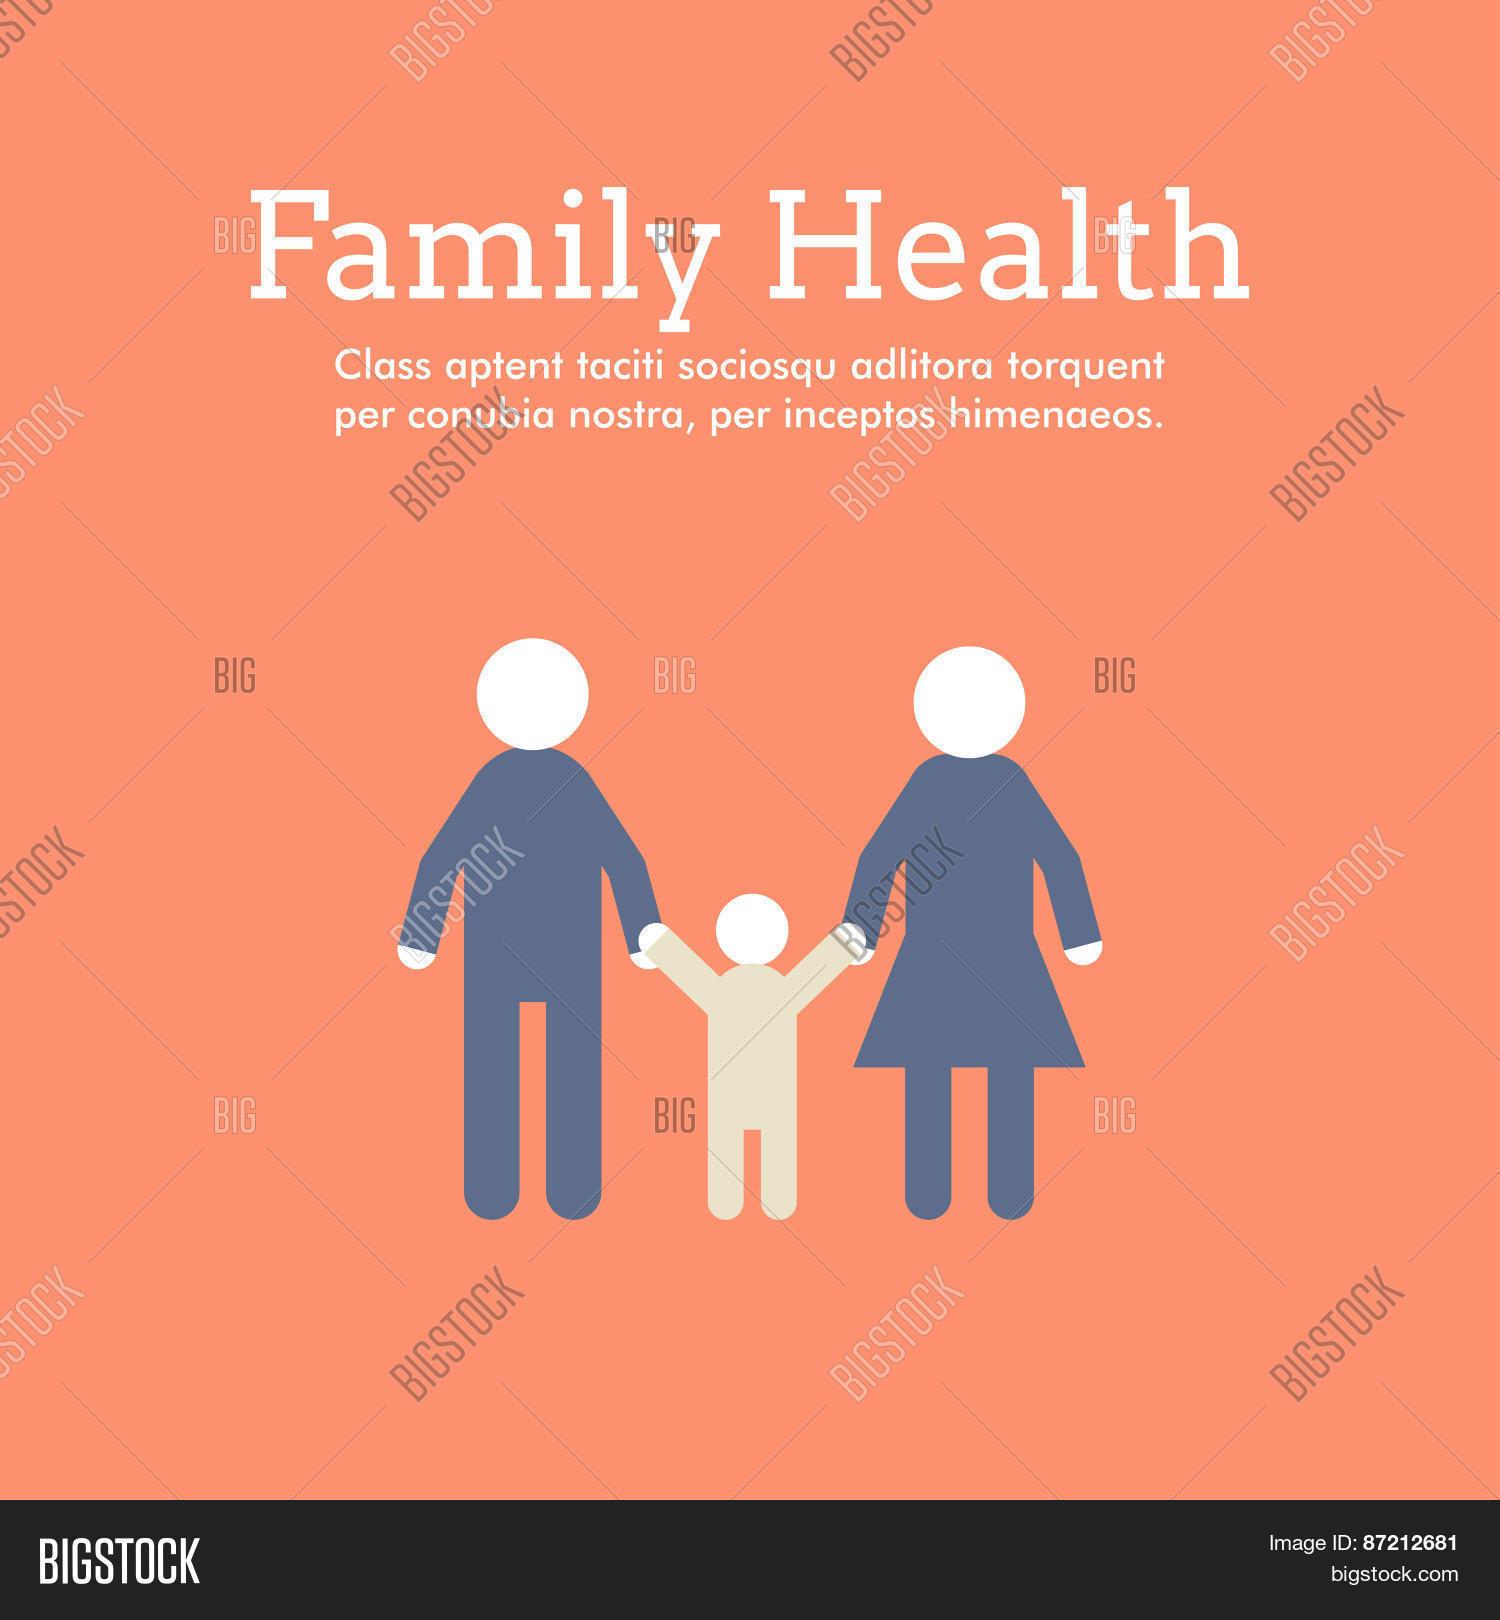 Poster design health - World Health Day Celebrating Card Or Poster Design Family Health Flat Design